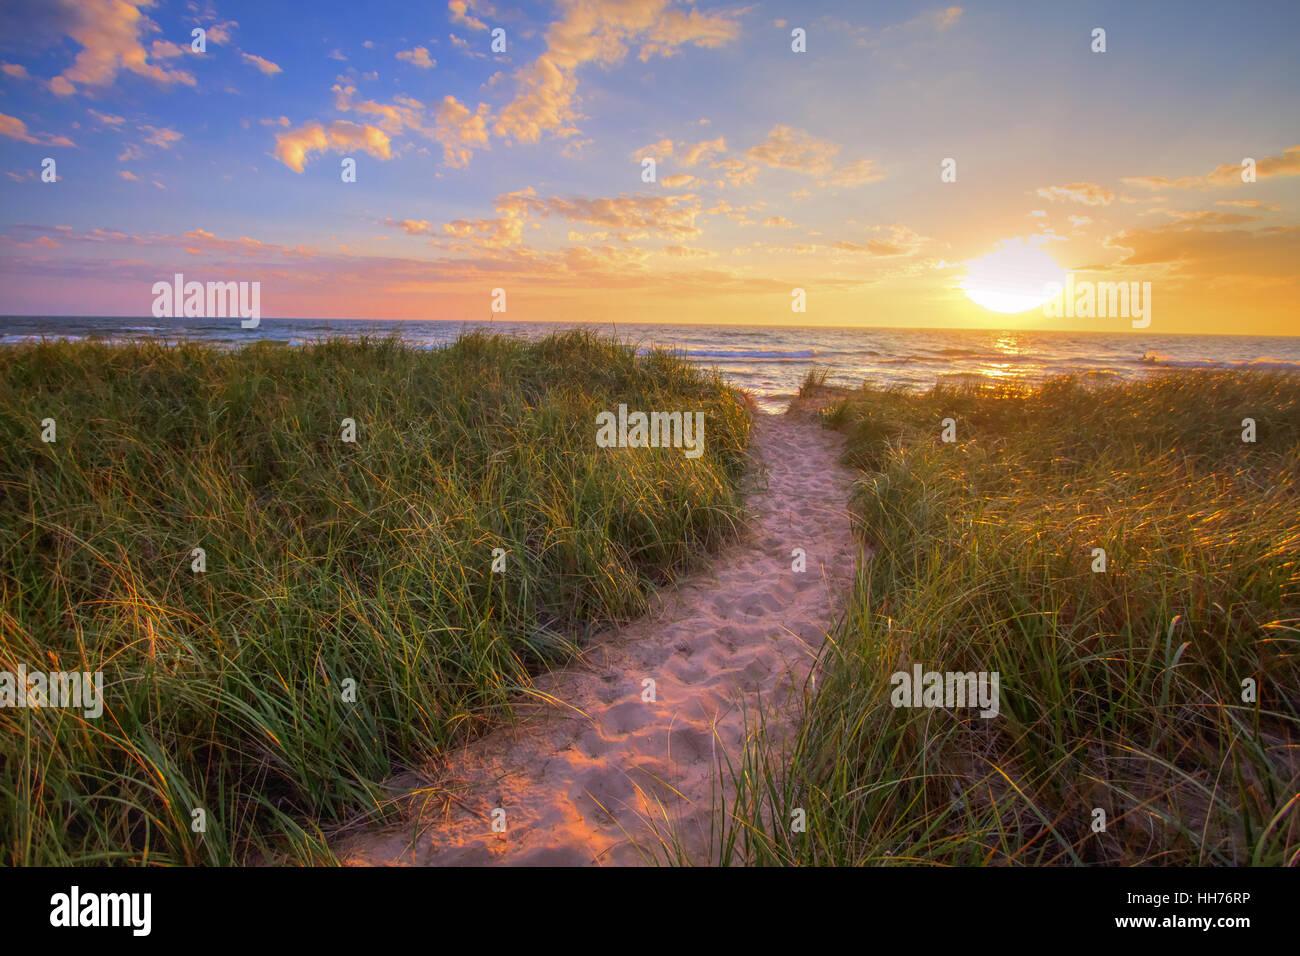 Ruta de acceso a una playa de la puesta del sol. Sendero serpenteante a través de dune grass lleva a sunset Imagen De Stock